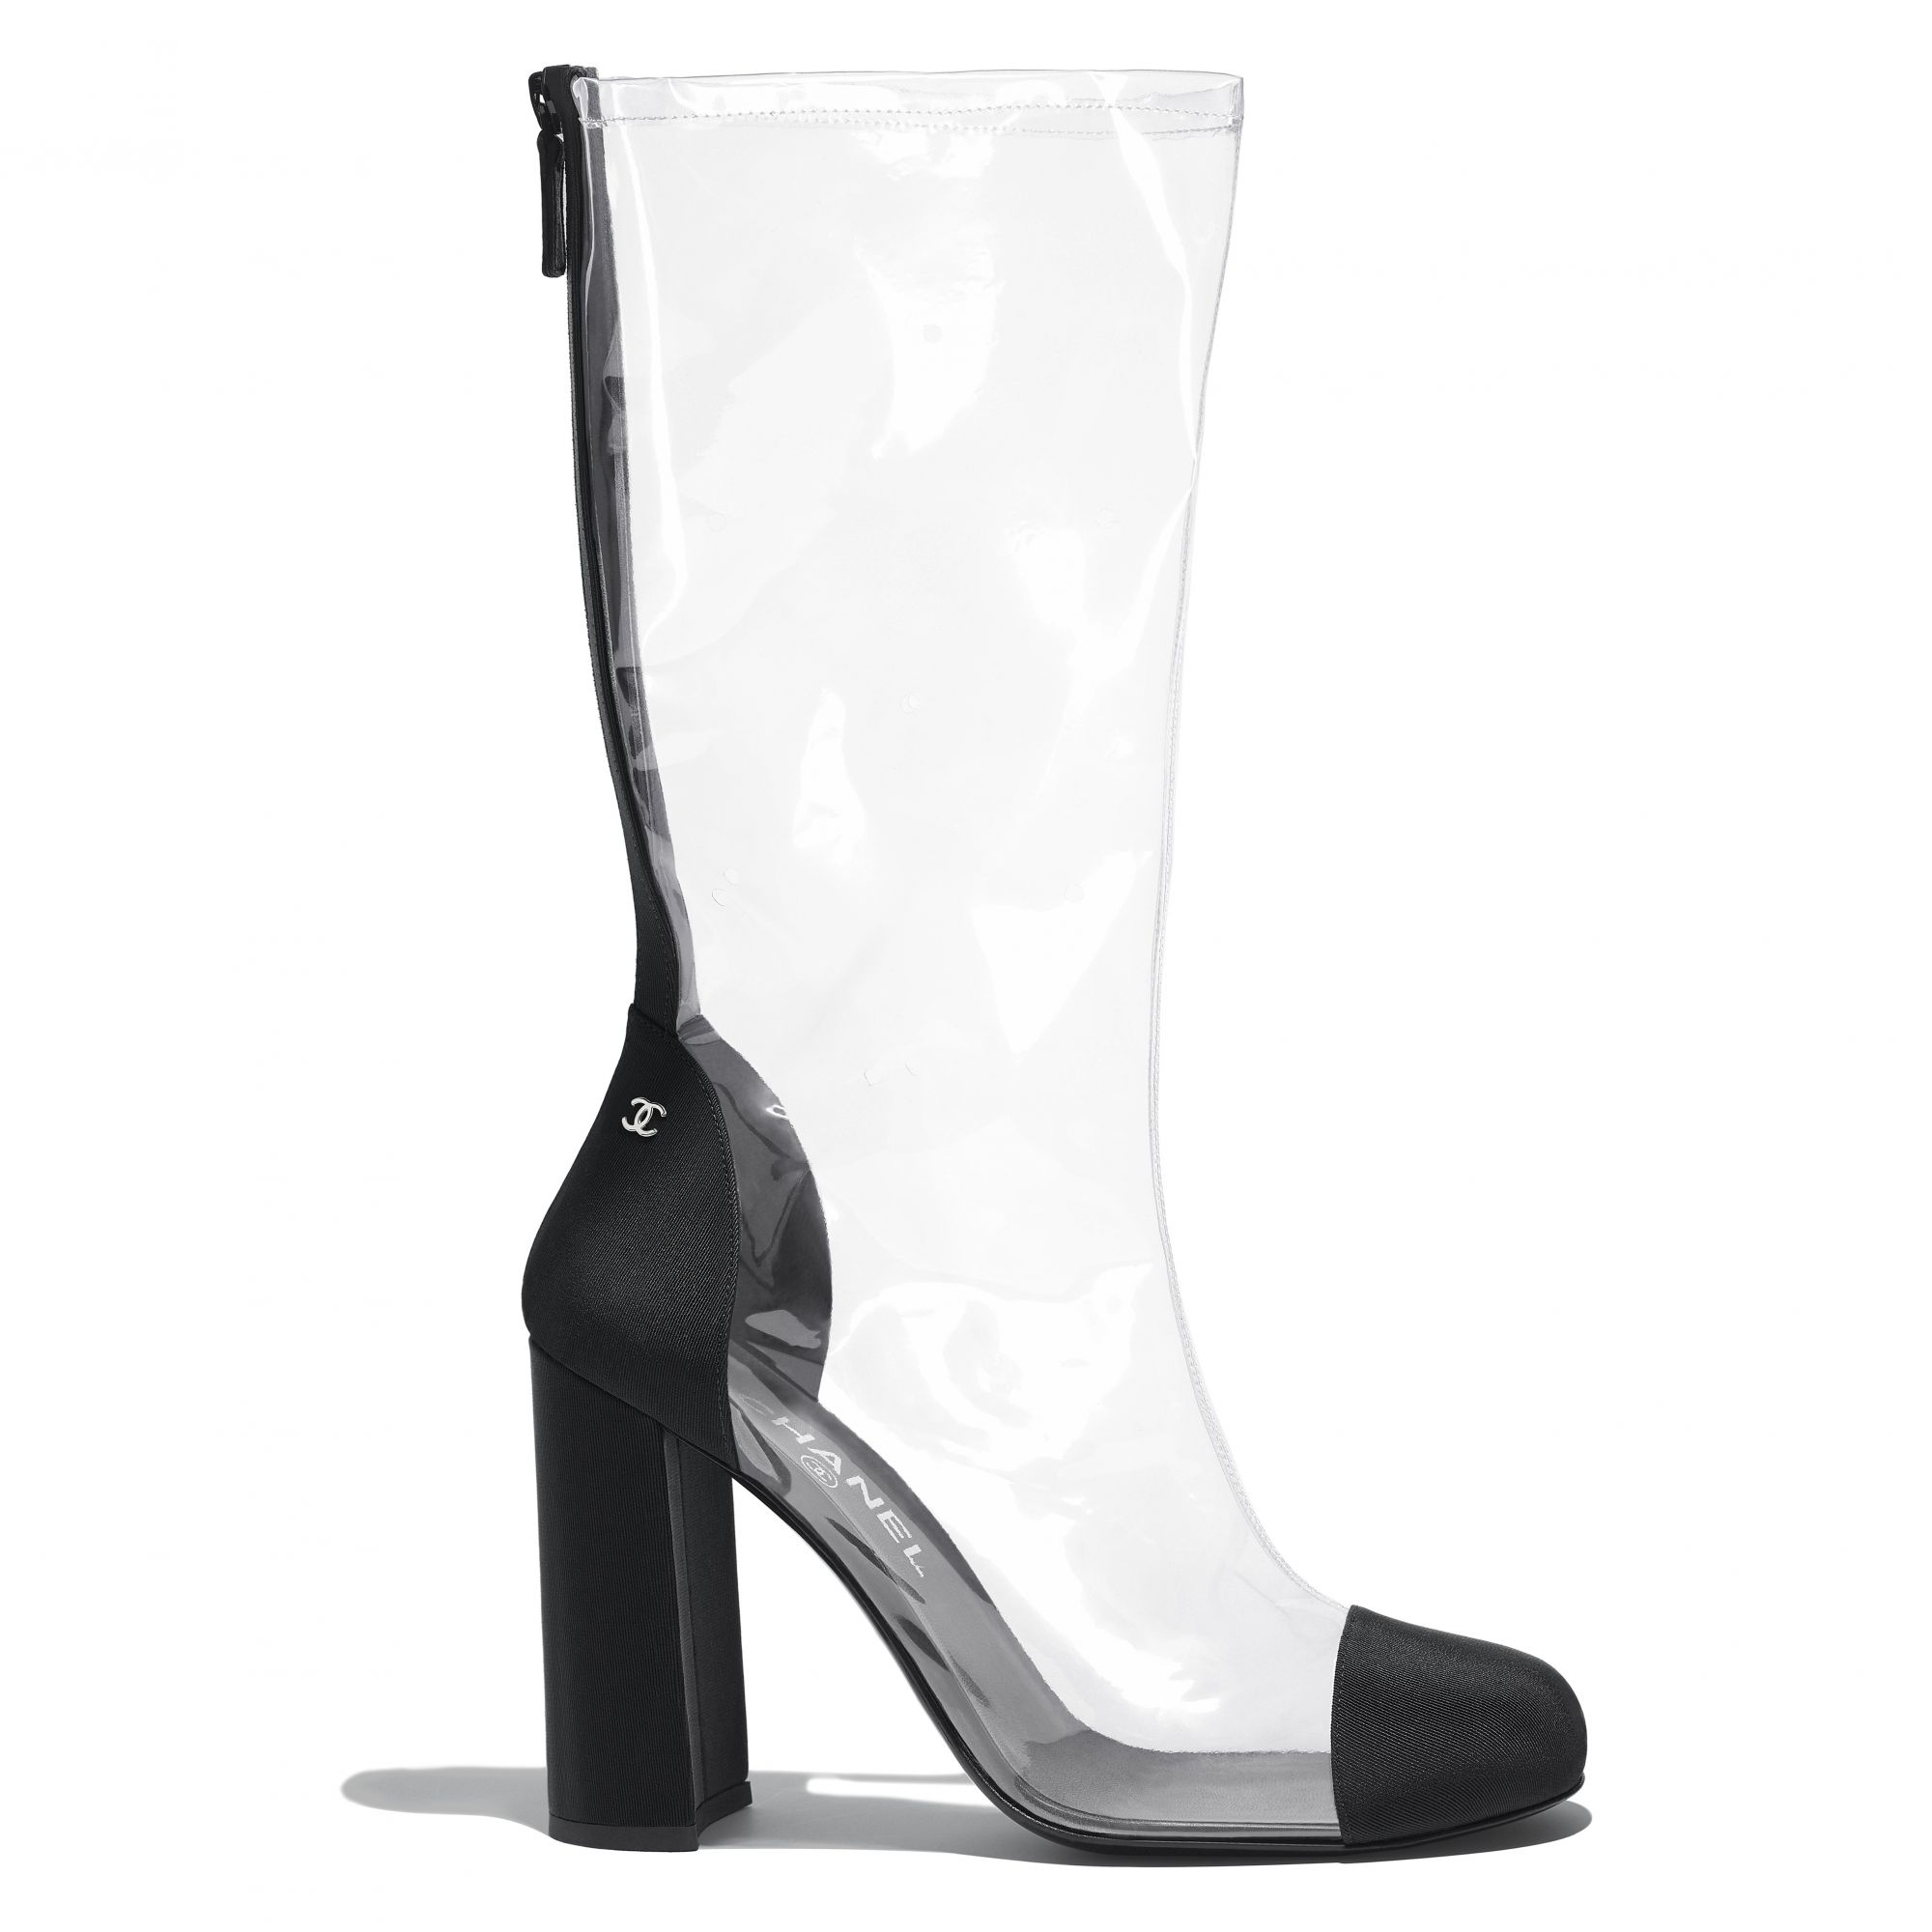 Boot in transparent PVC and black grosgrain